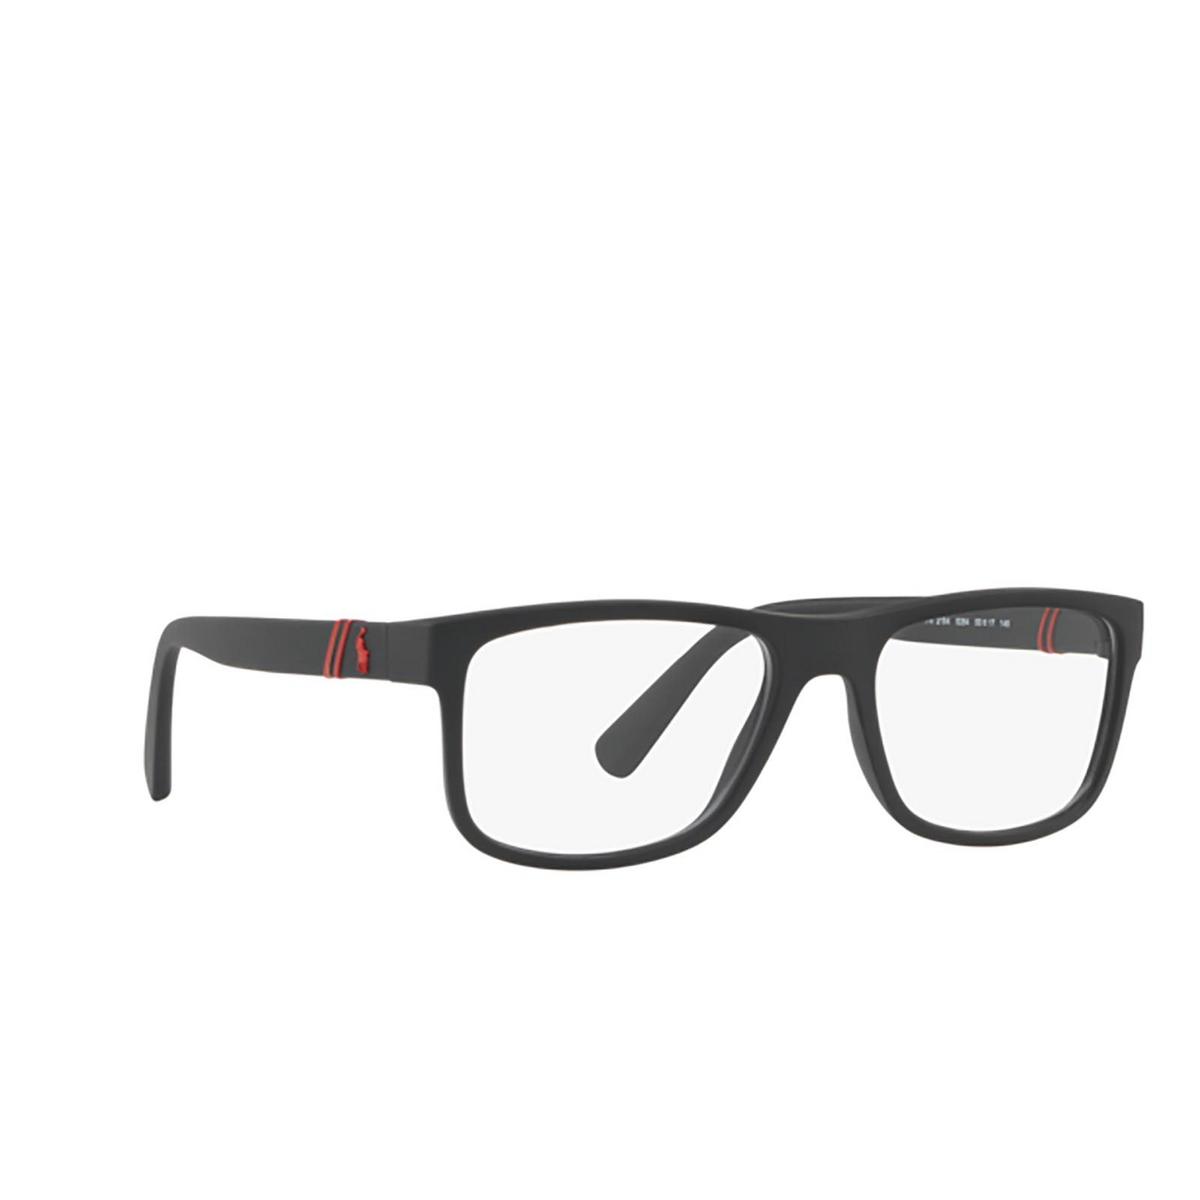 Polo Ralph Lauren® Rectangle Eyeglasses: PH2184 color Matte Black 5284 - three-quarters view.